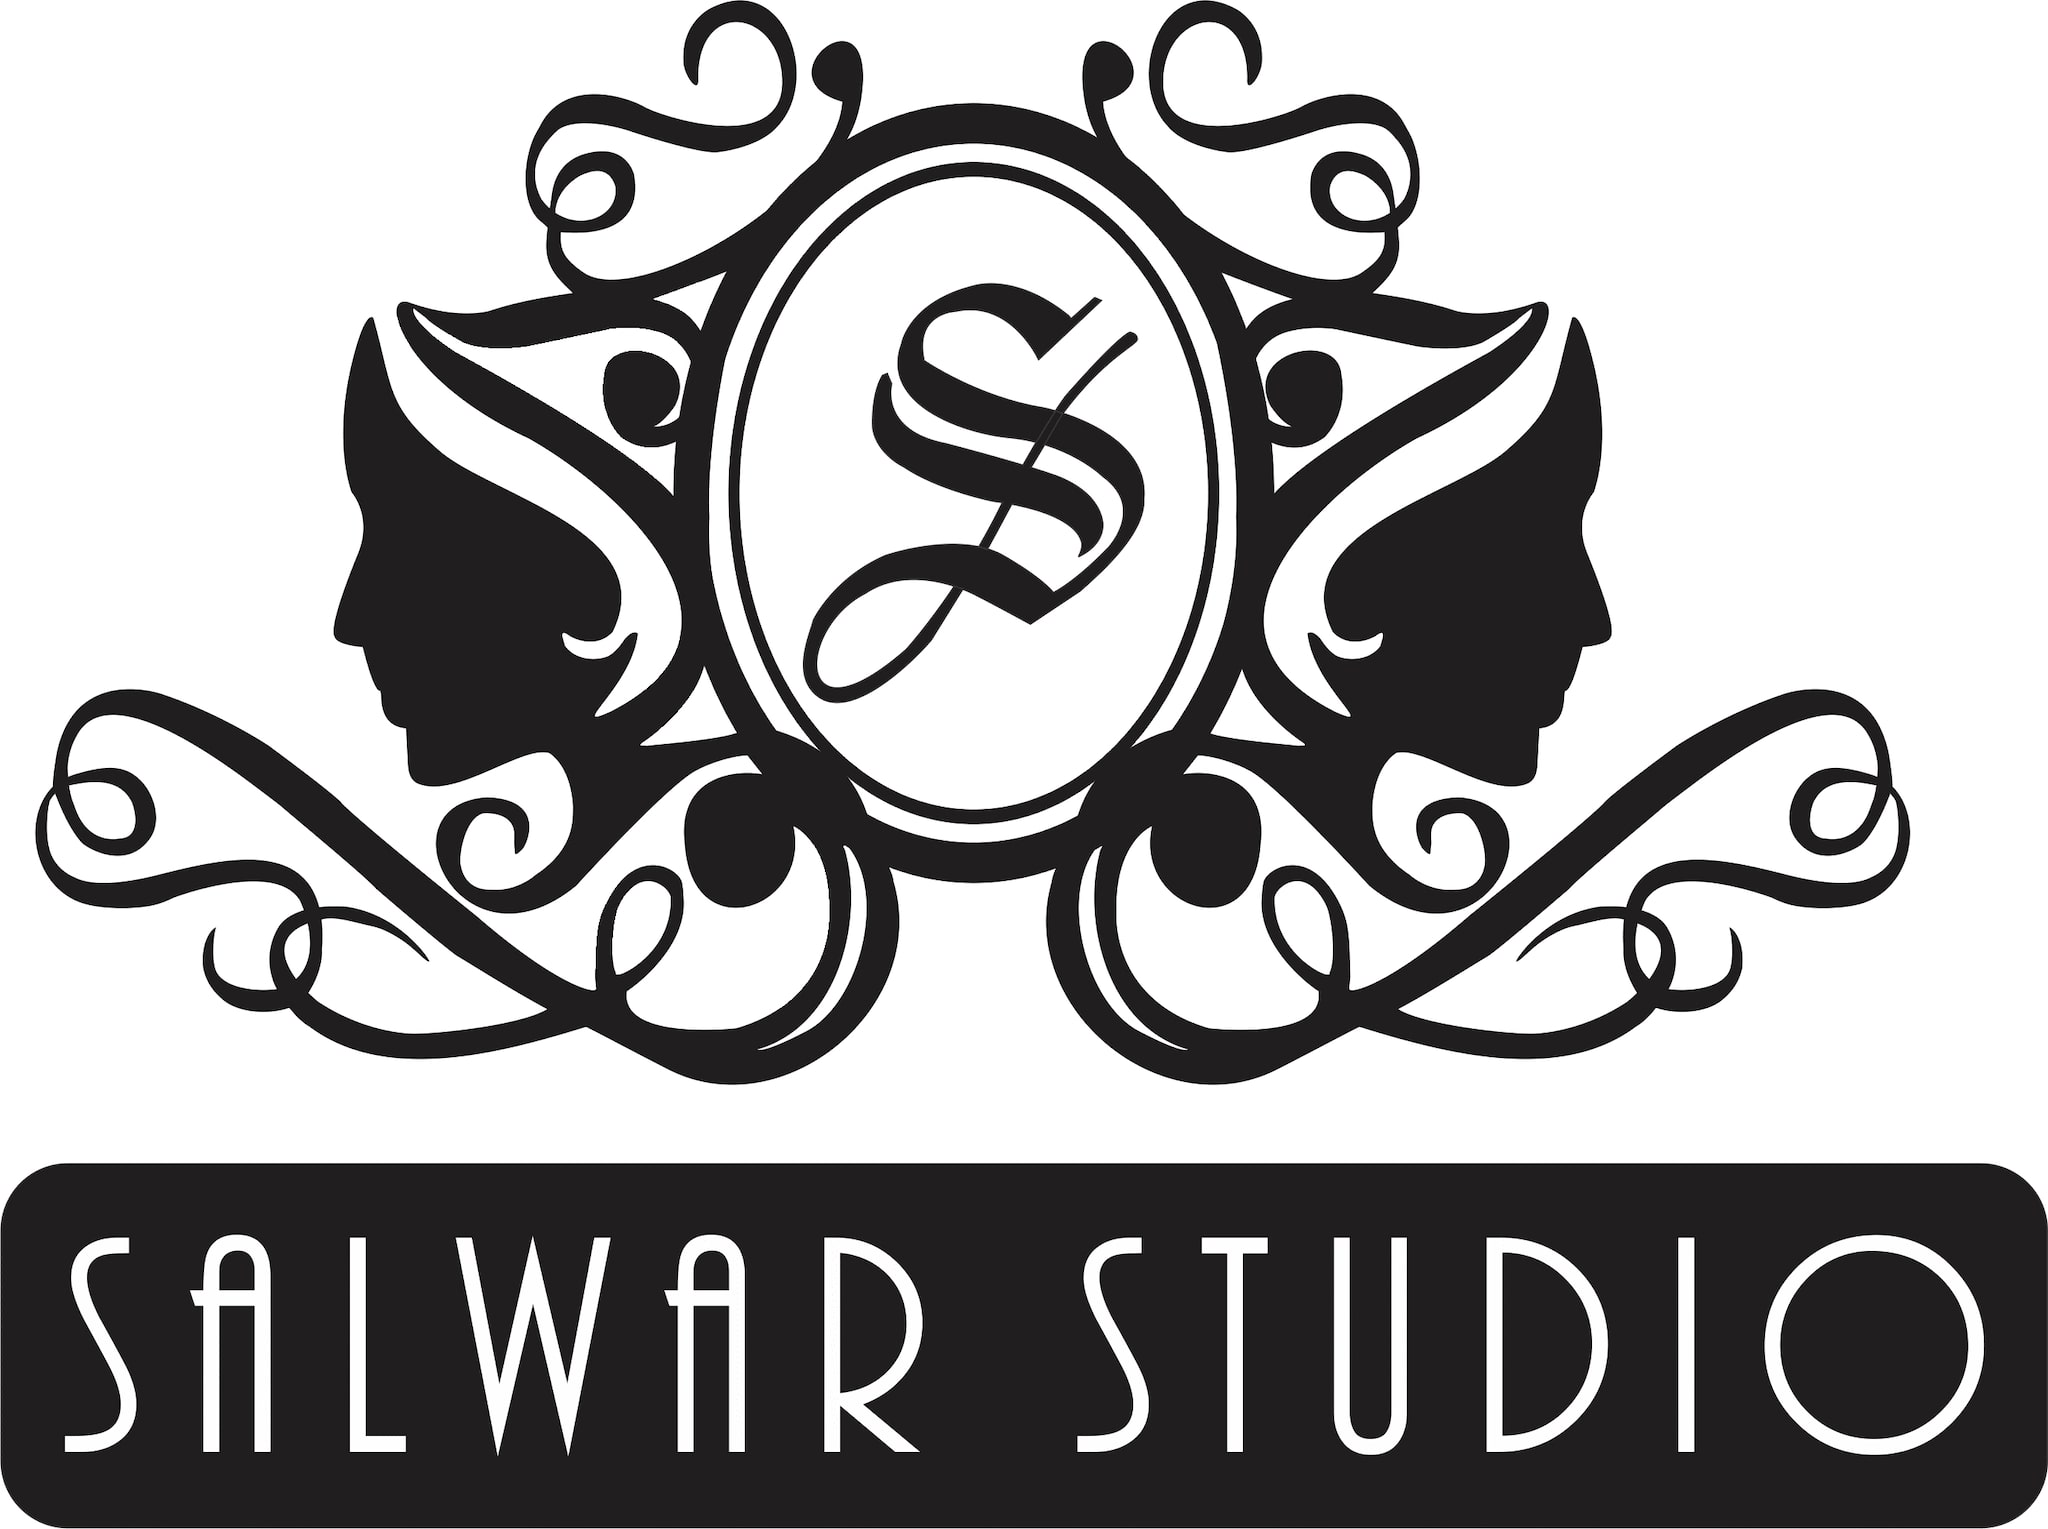 Salwar Studio